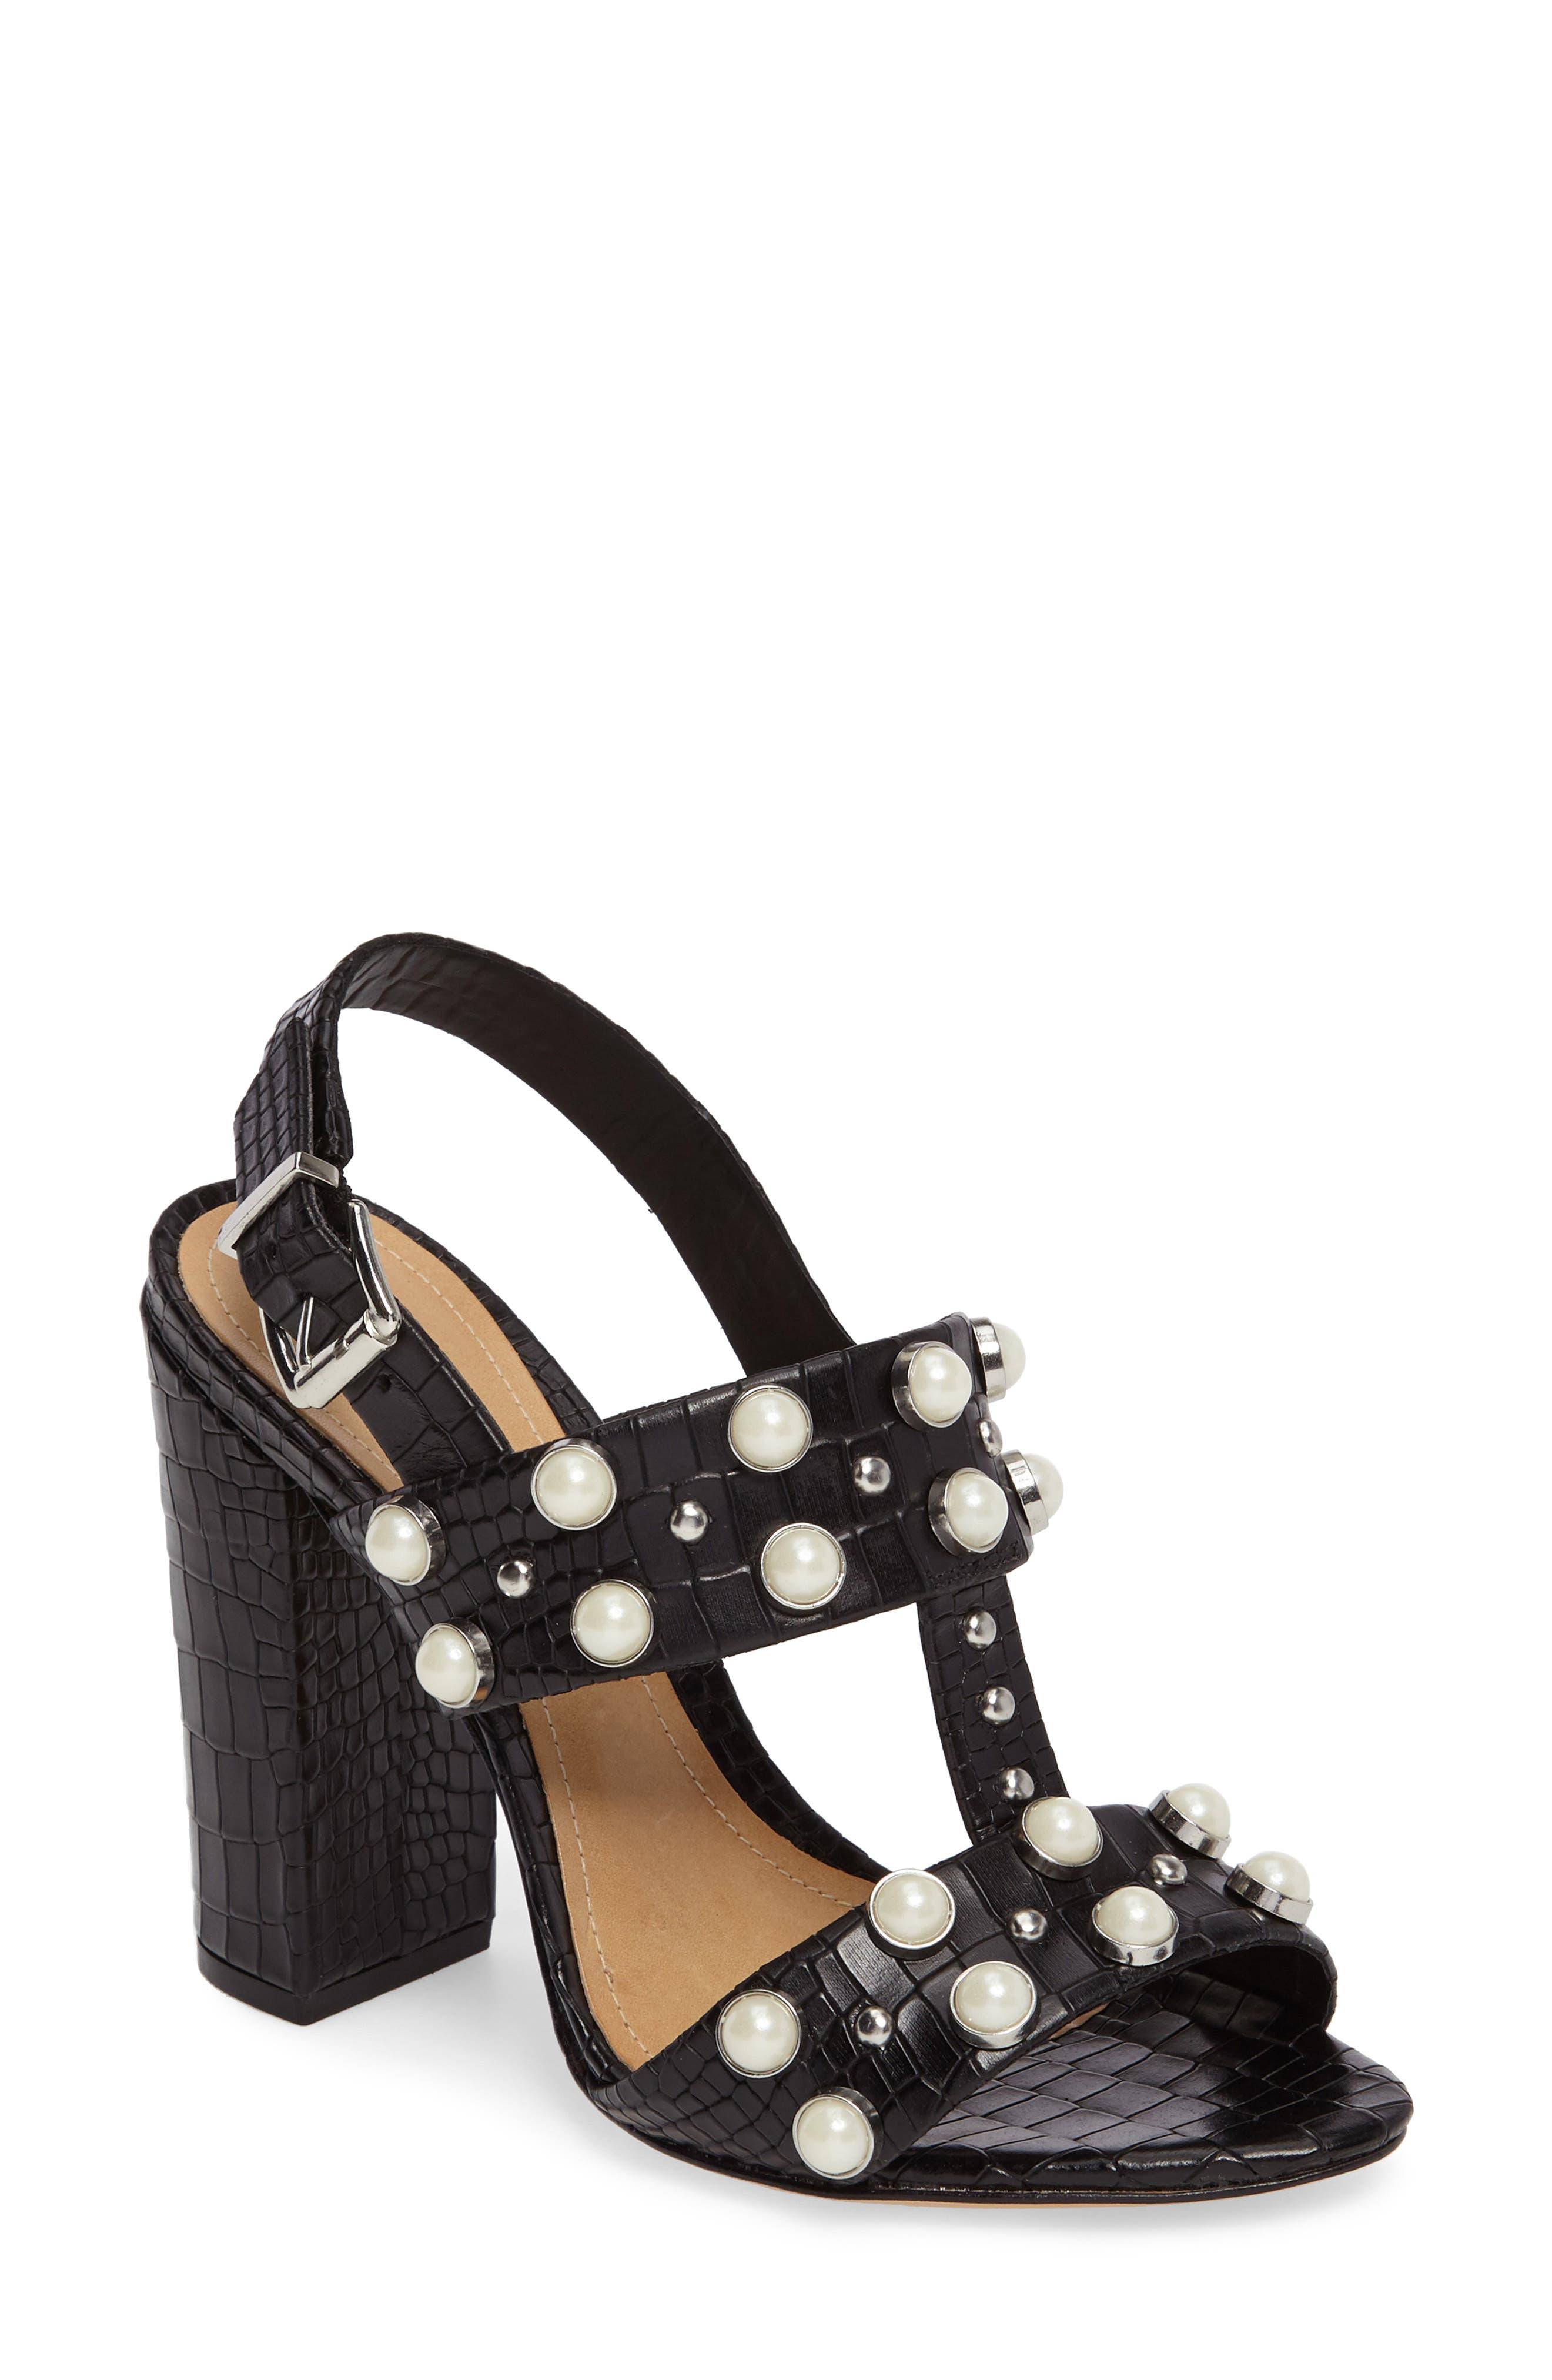 Alternate Image 1 Selected - Schutz Zarita Imitation Pearl Embellished Sandal (Women)